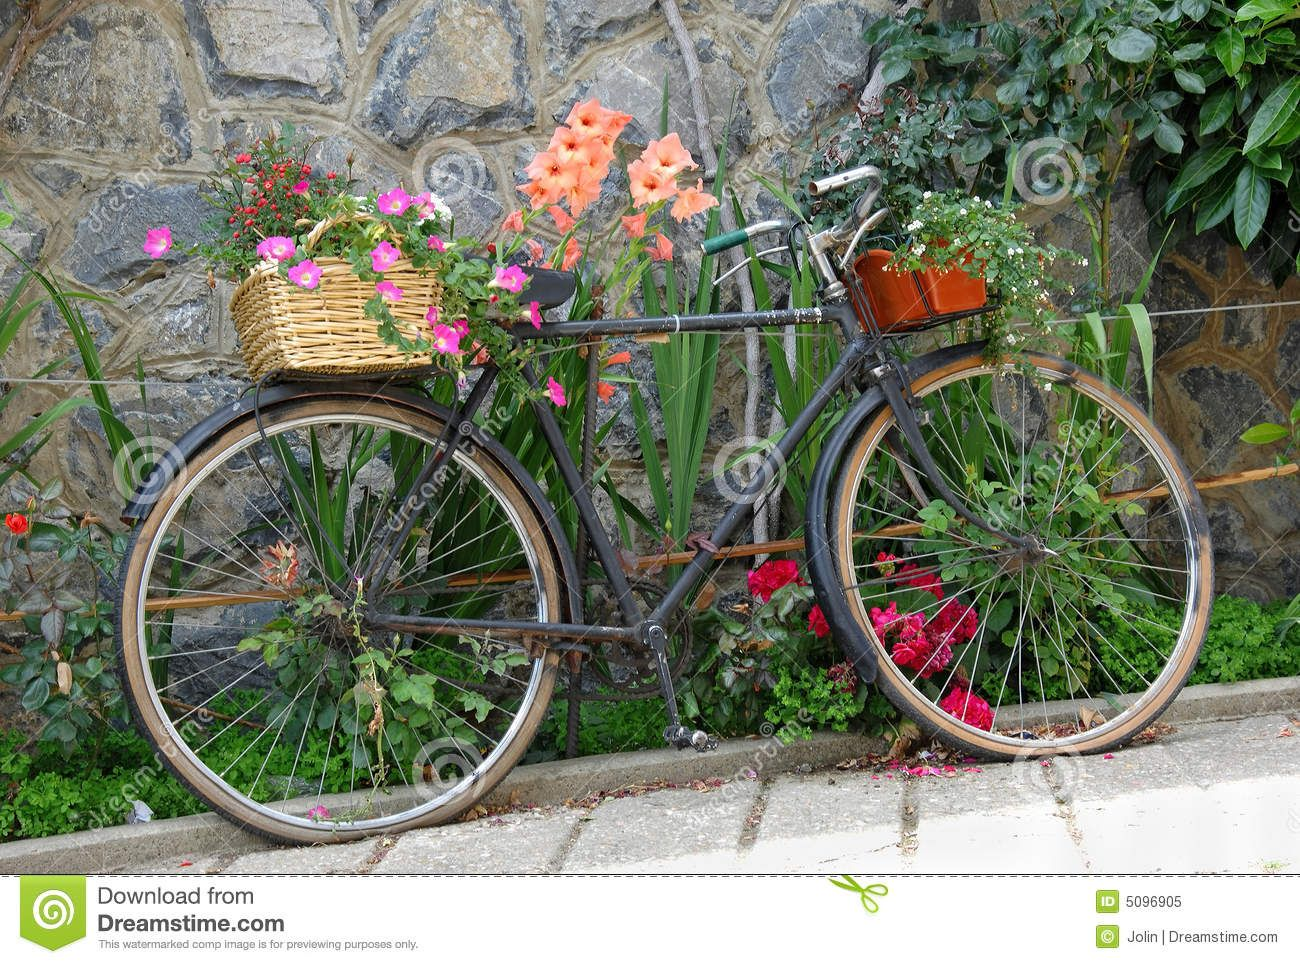 Garden decor bicycle  vieux bicyclette avec fleurs  Google Search  French Rustic Table